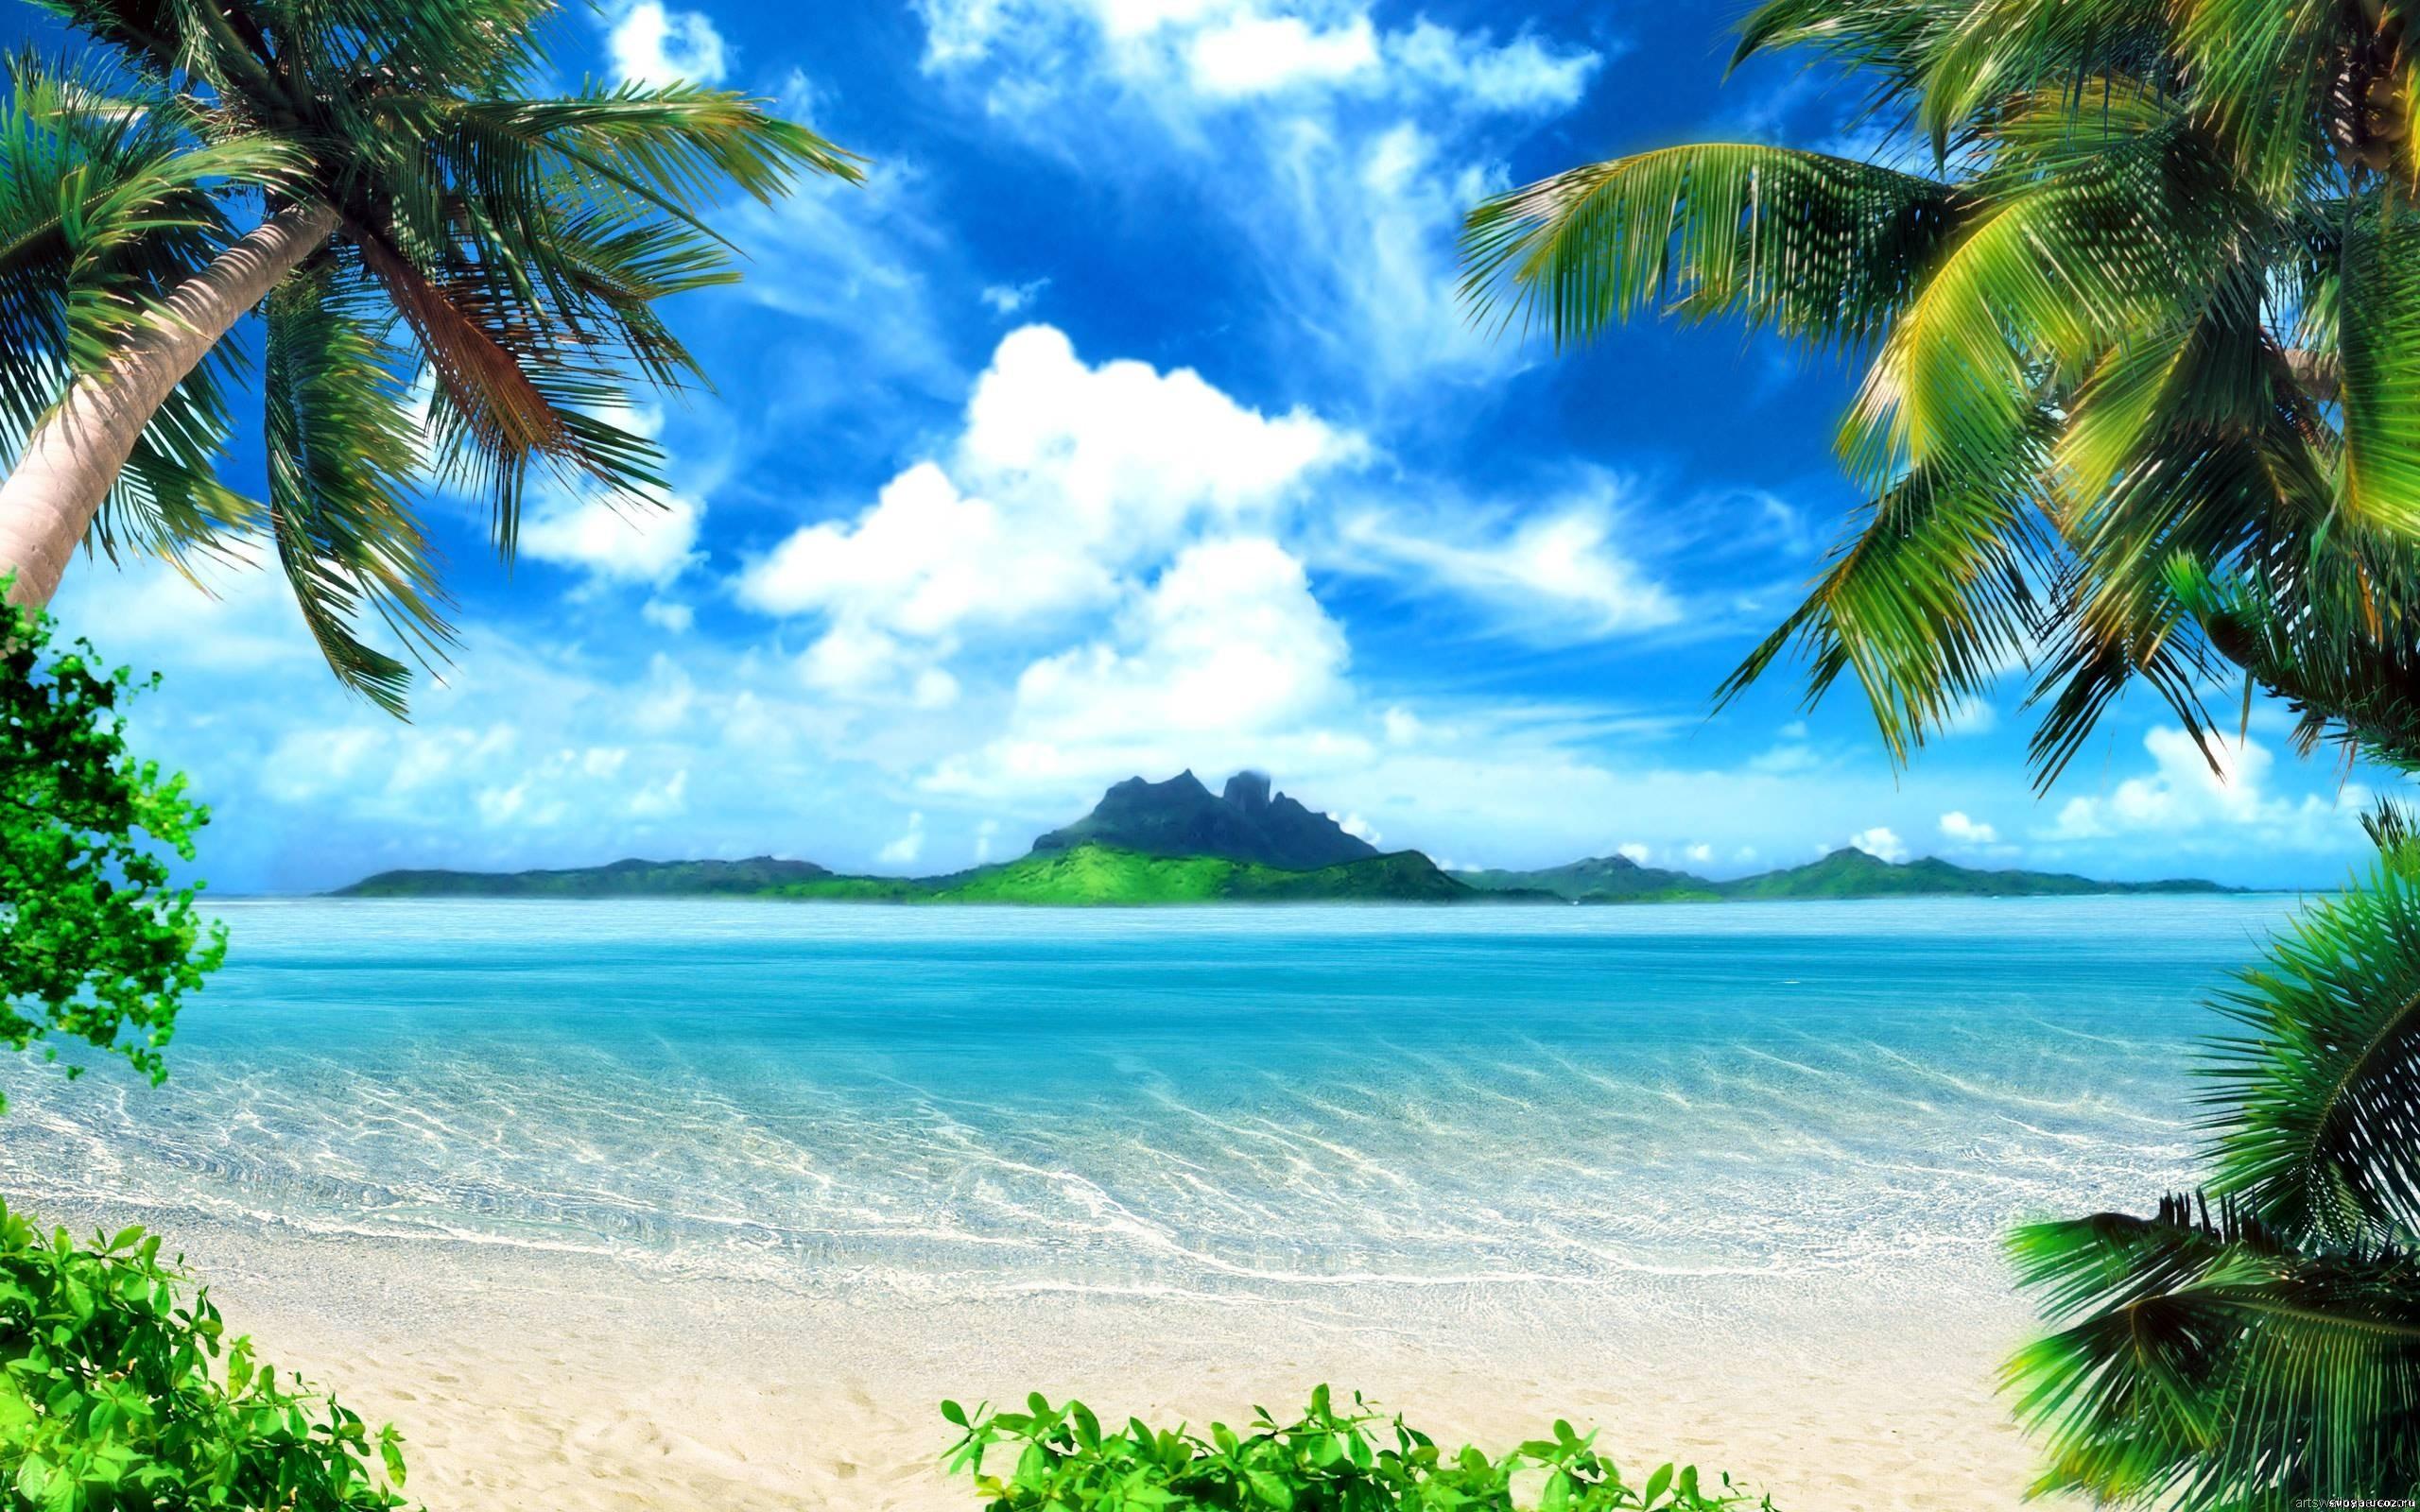 25 Sea Ocean Wallpaper, HD, Full HD 1080p, Desktop Wallpaper .